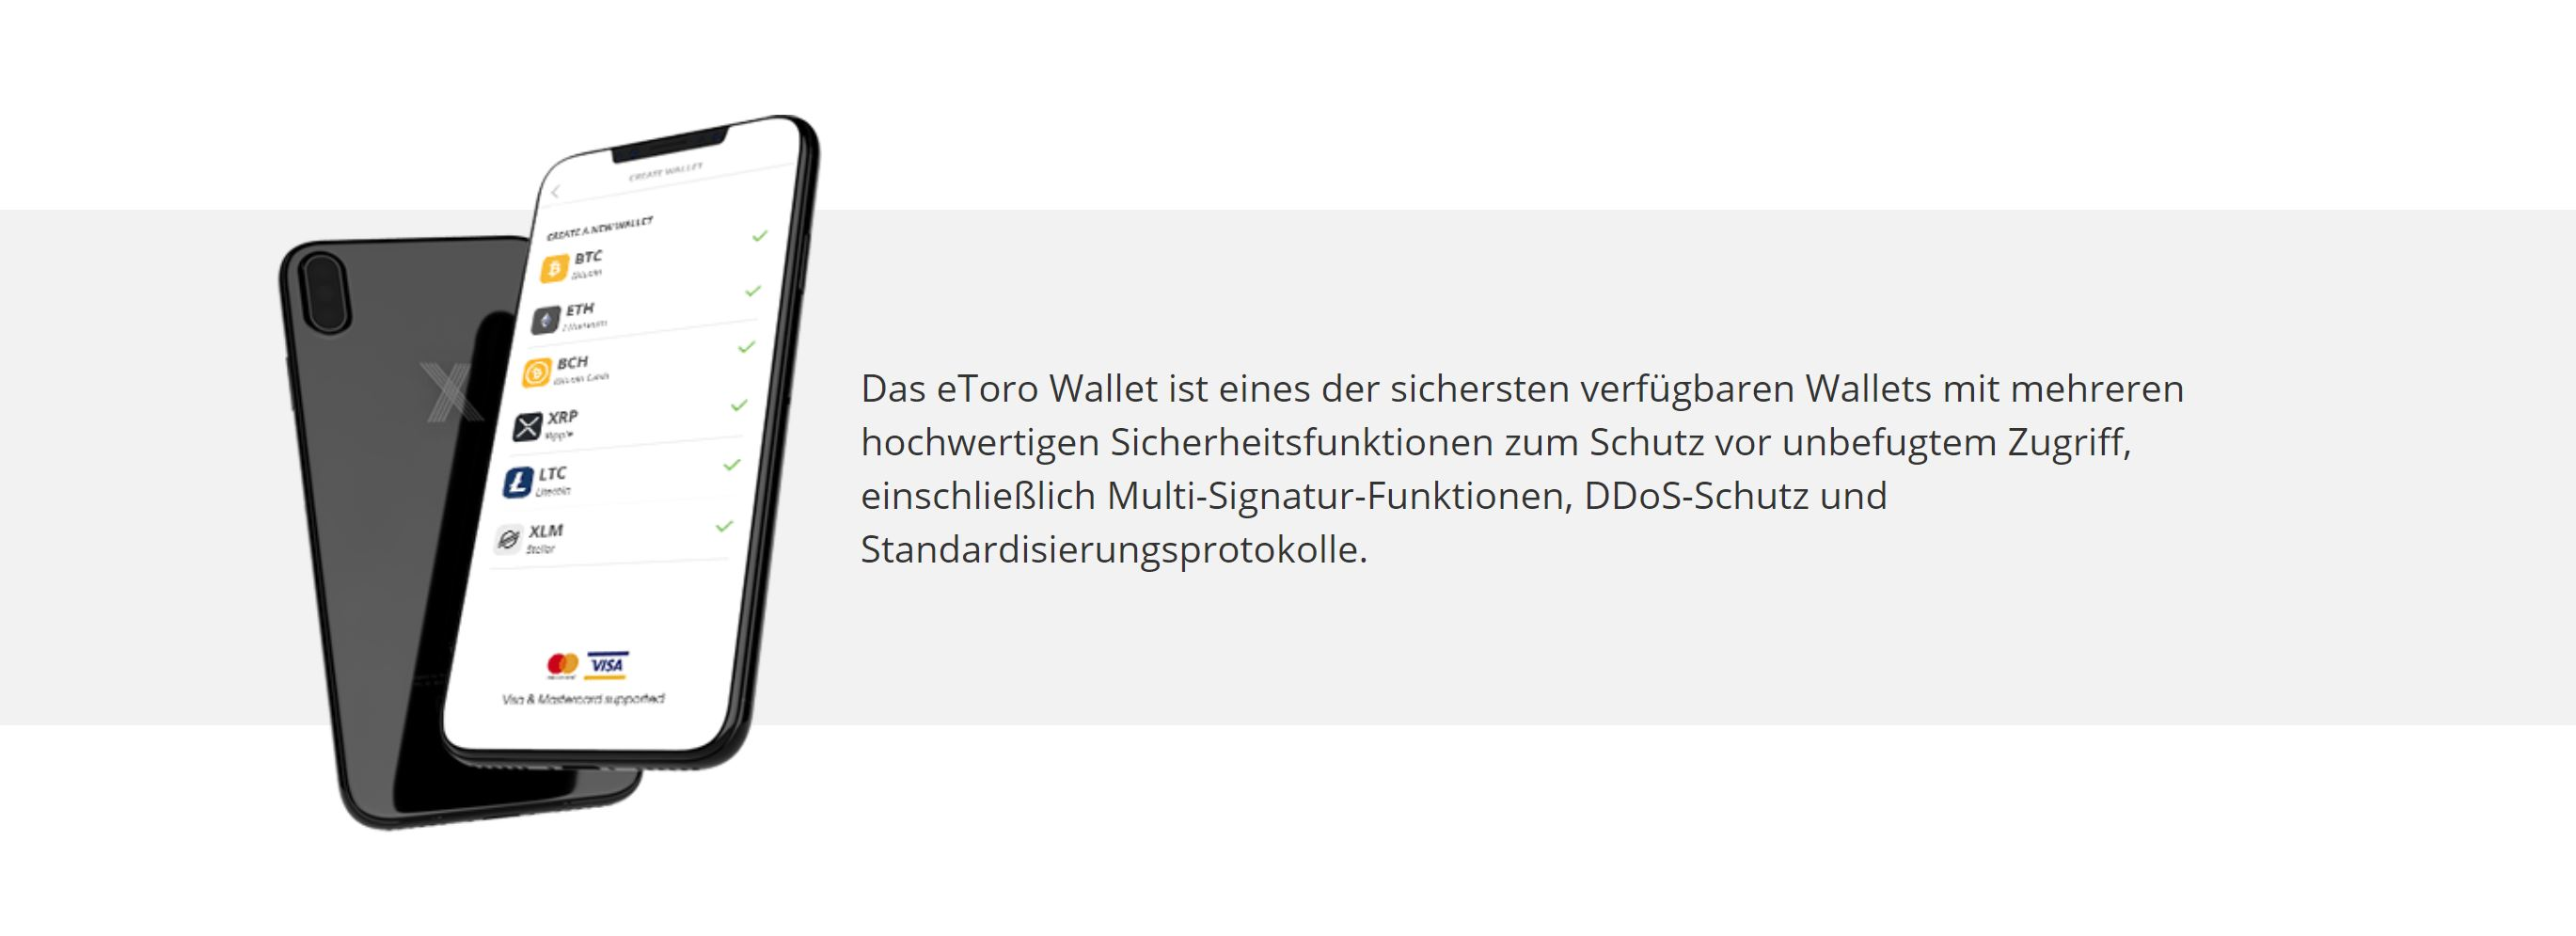 eToro Wallet Sicherheitsmaßnahmen